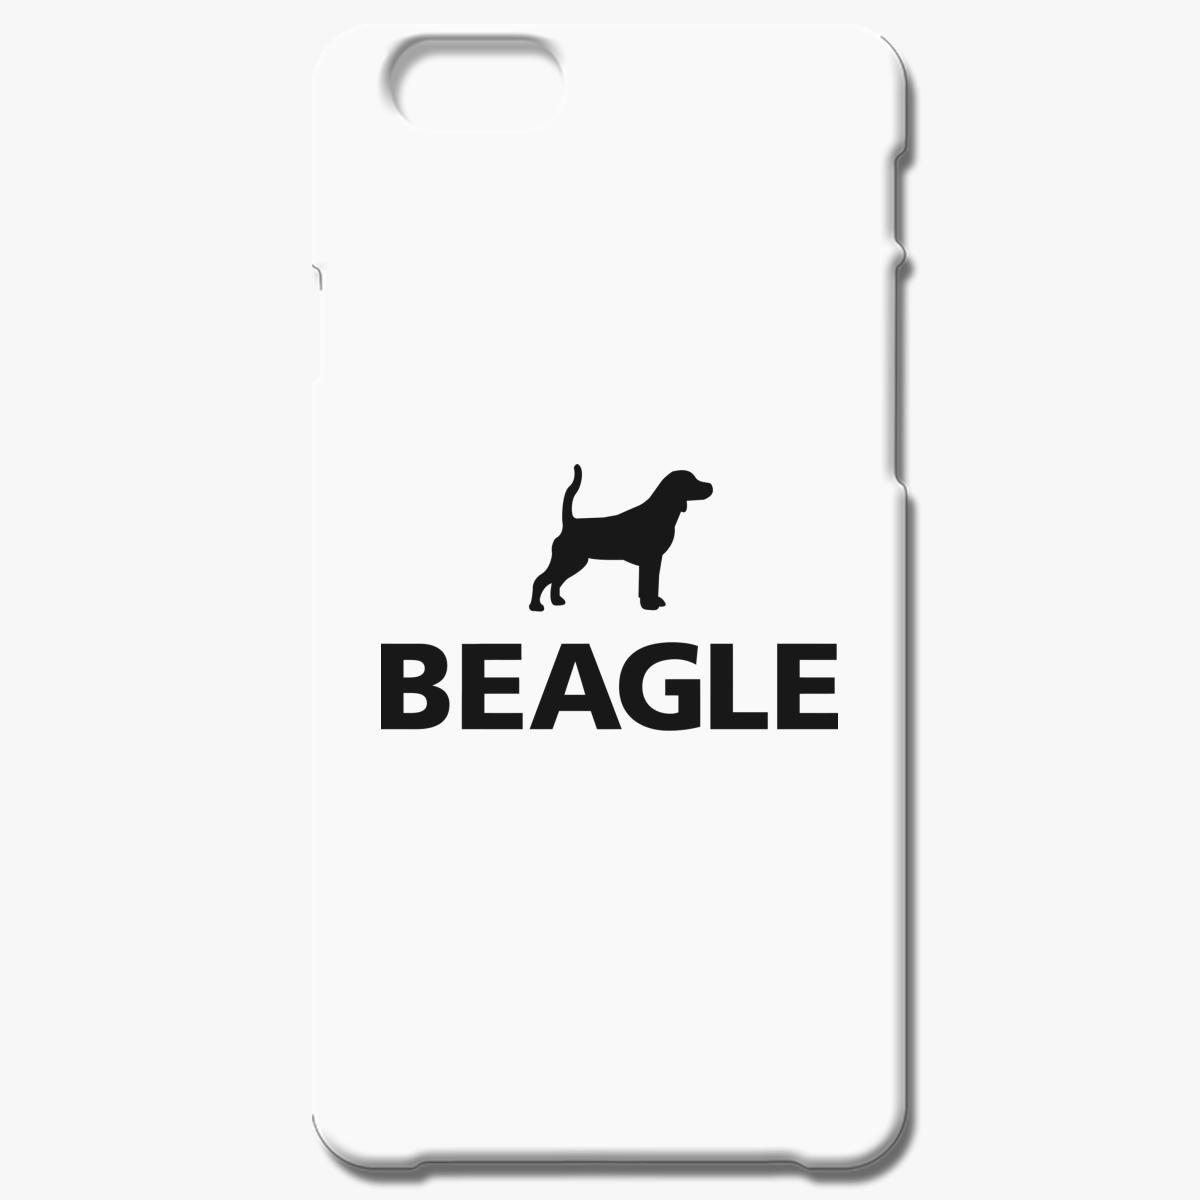 The Regal Beagle Iphone 6 6s Plus Case